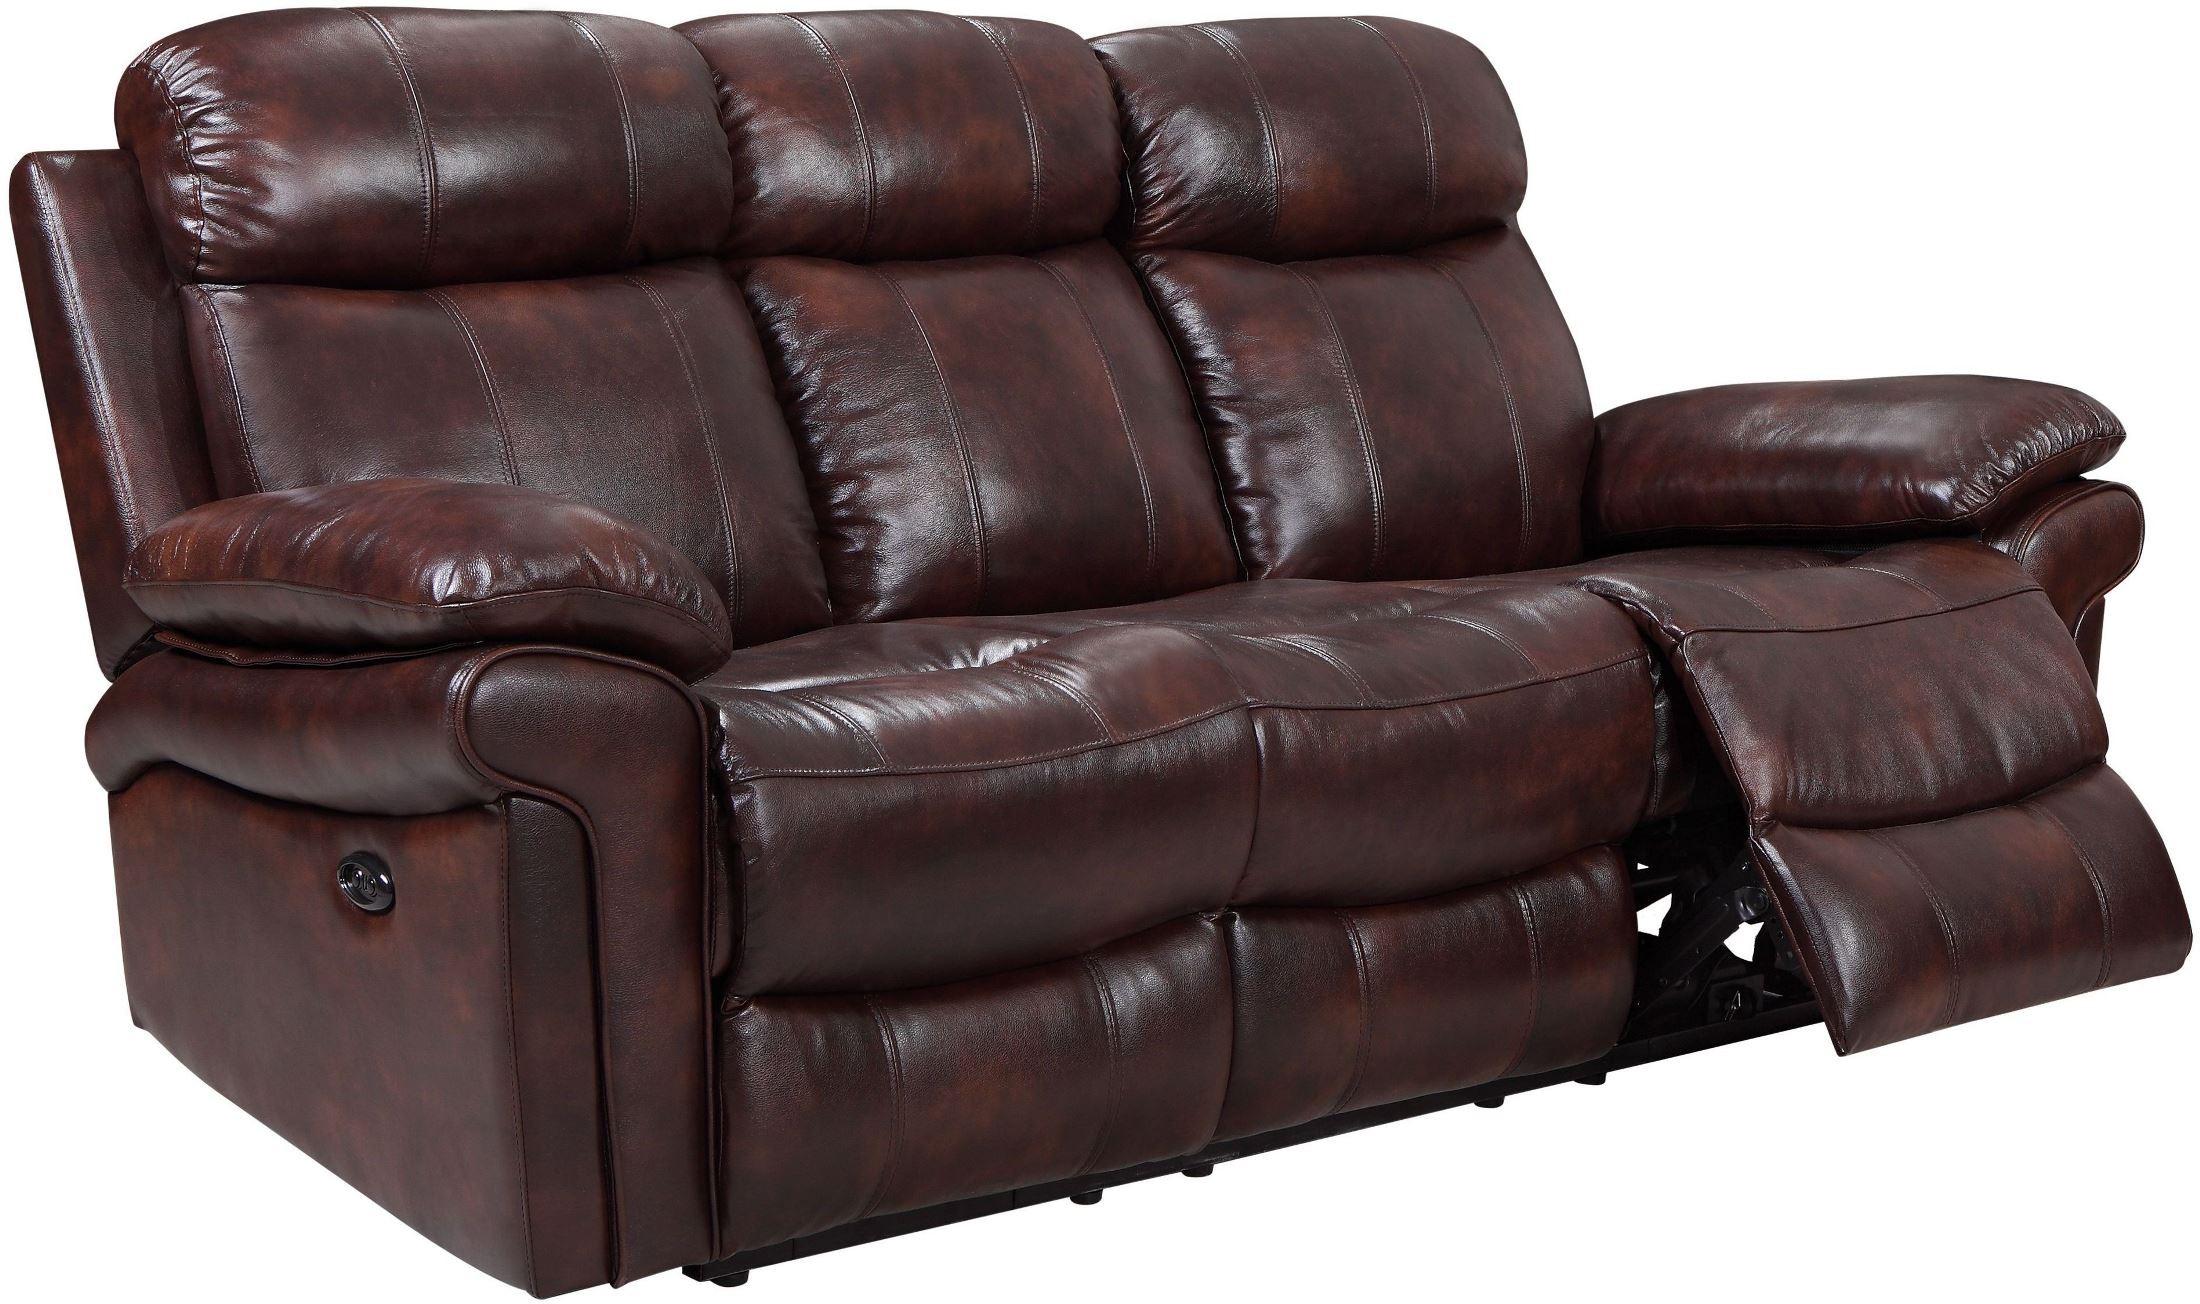 reclining sofa leather brown gray nailhead set shae joplin power from